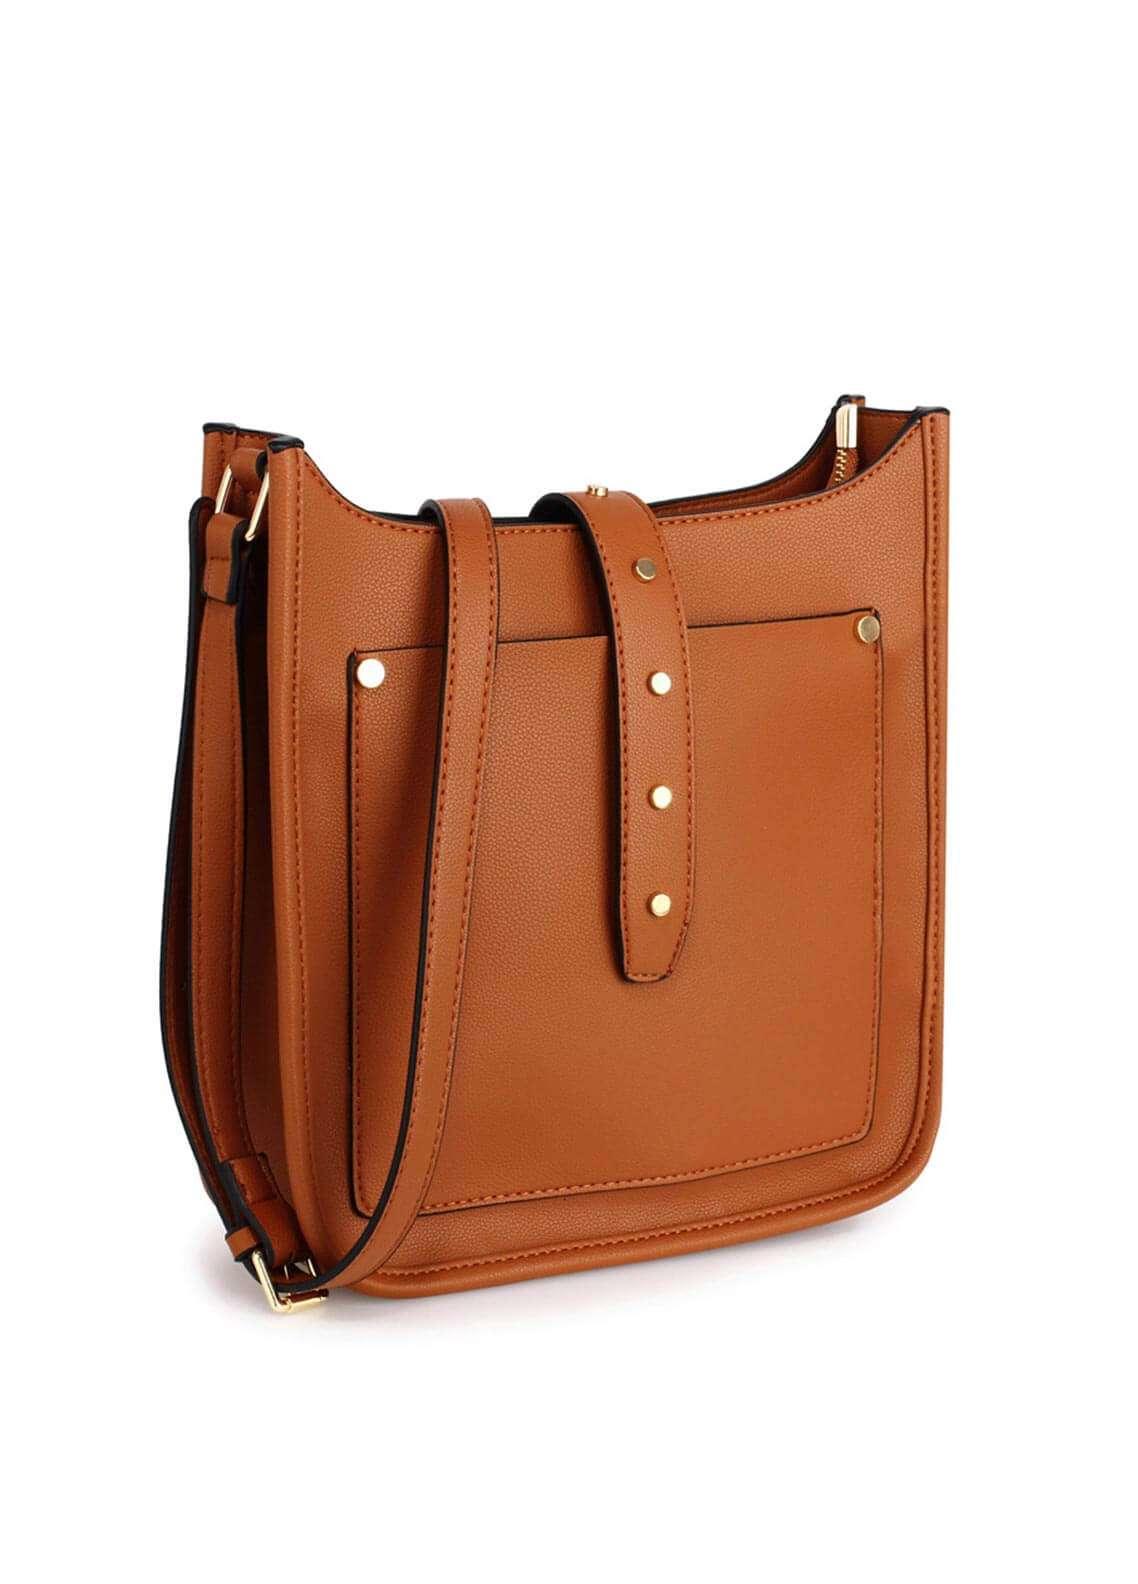 Anna Grace London Faux Leather Shoulder  Bags for Woman - Brown